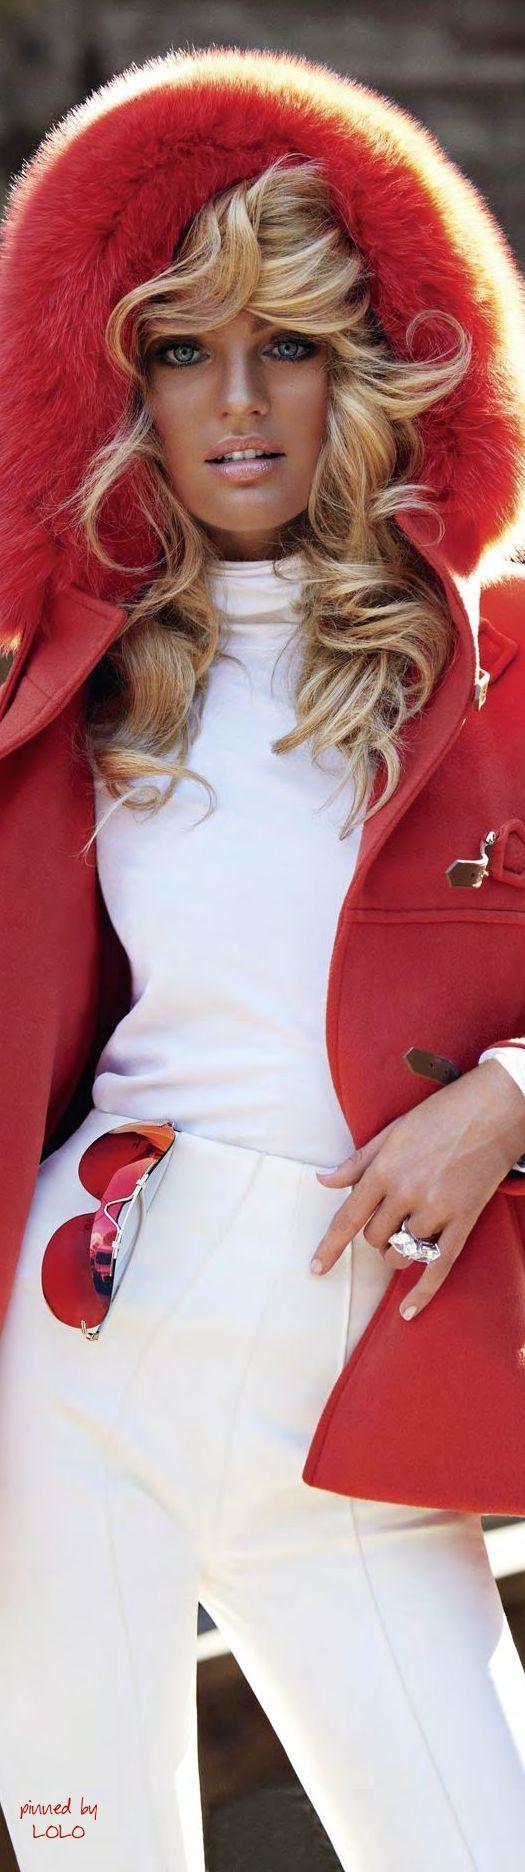 Candice Swanepoel Sebastian Faena Photoshoot   LOLO